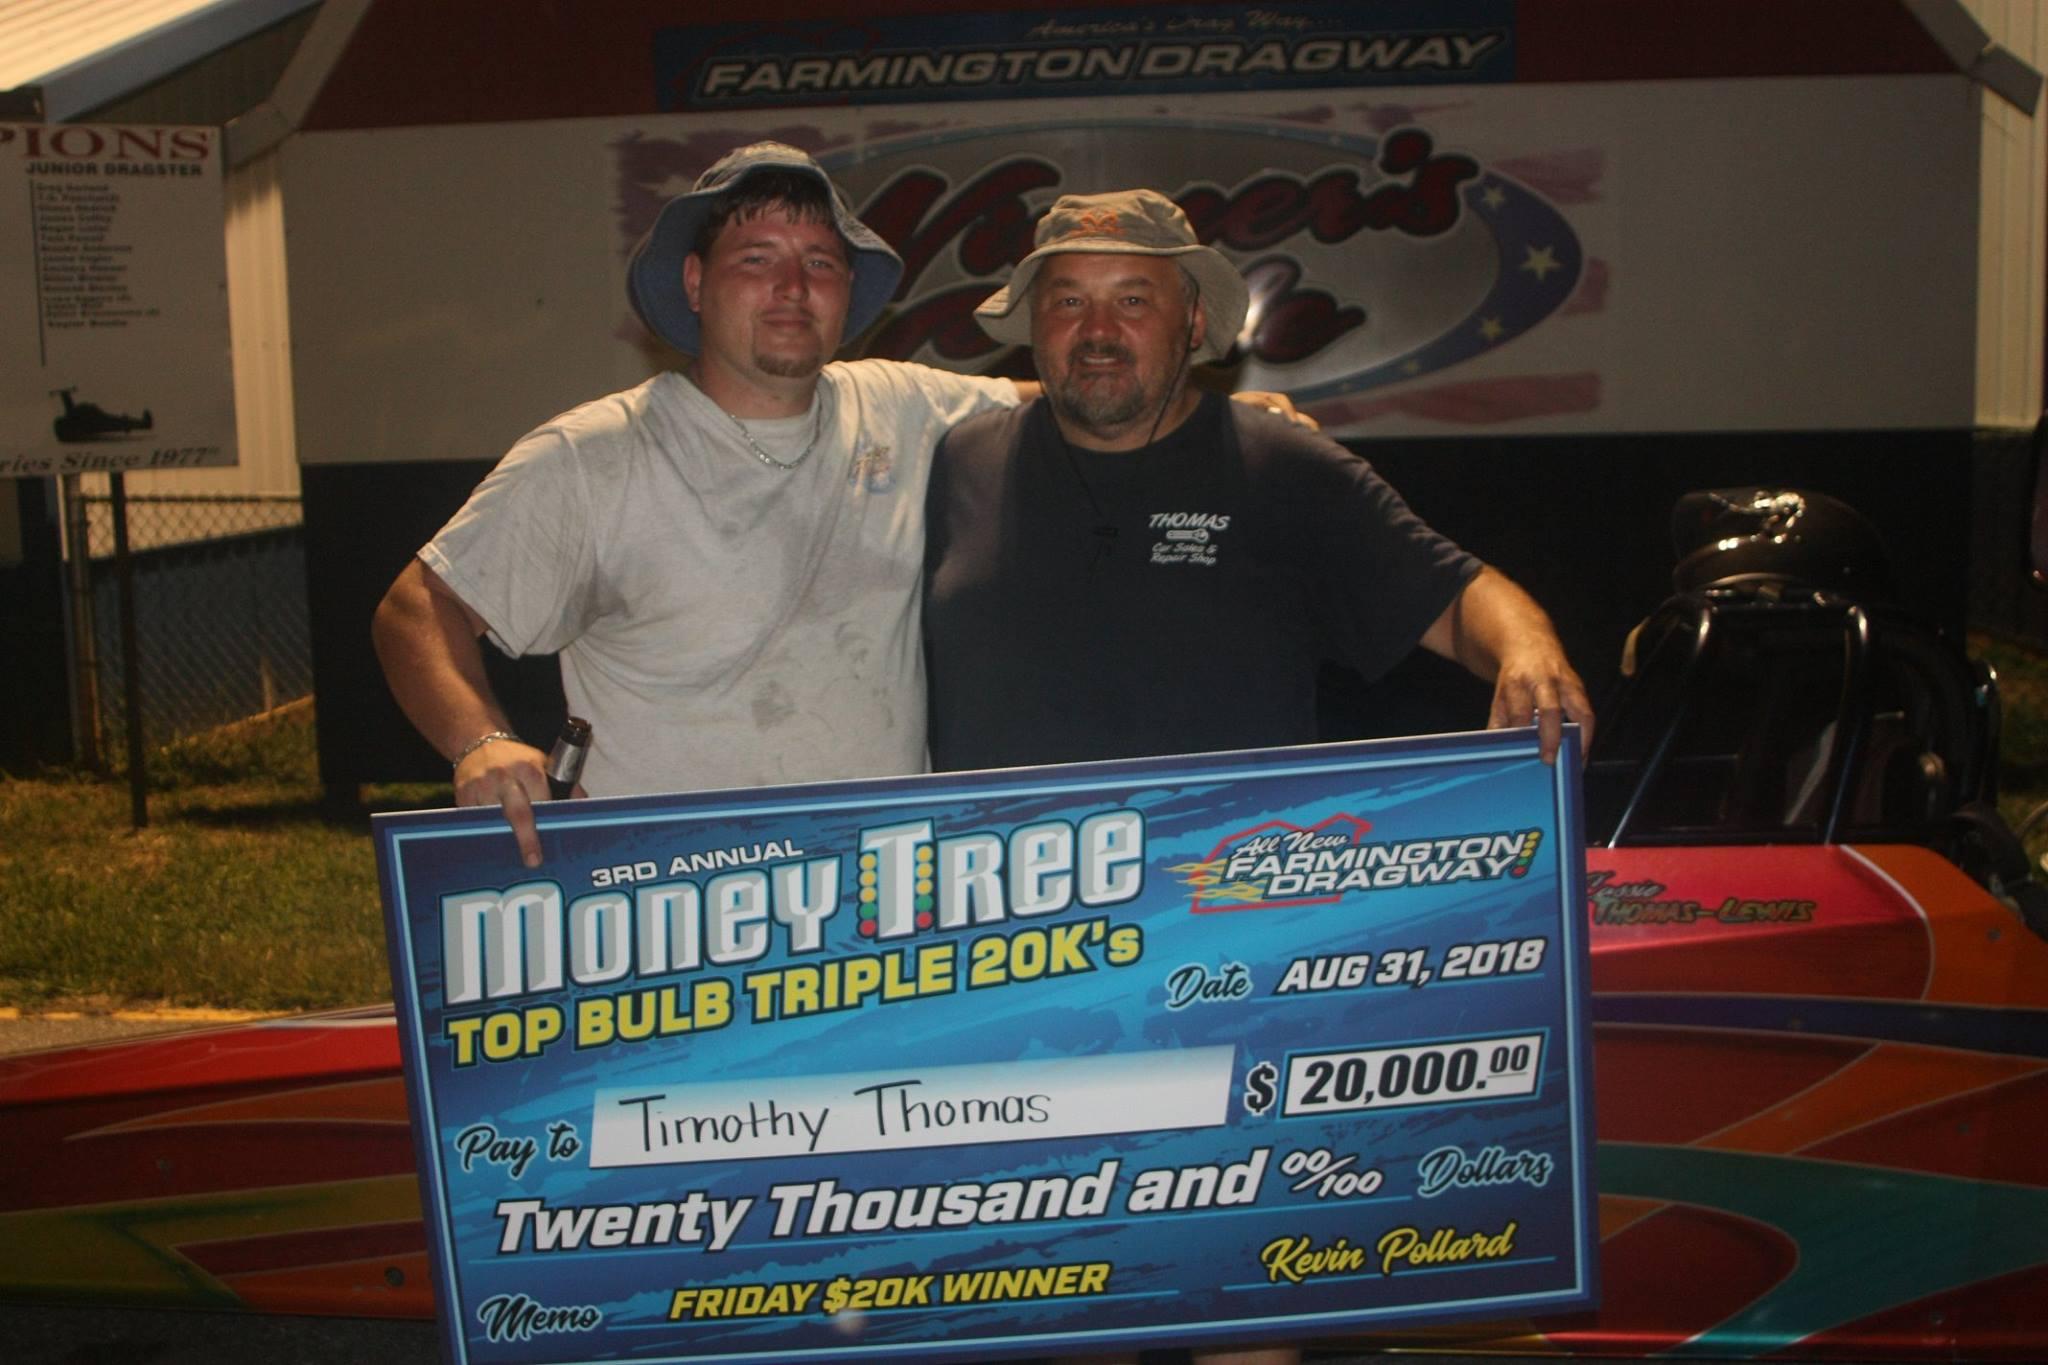 Timothy Thomas Seals the deal on $20,000 at Farmington